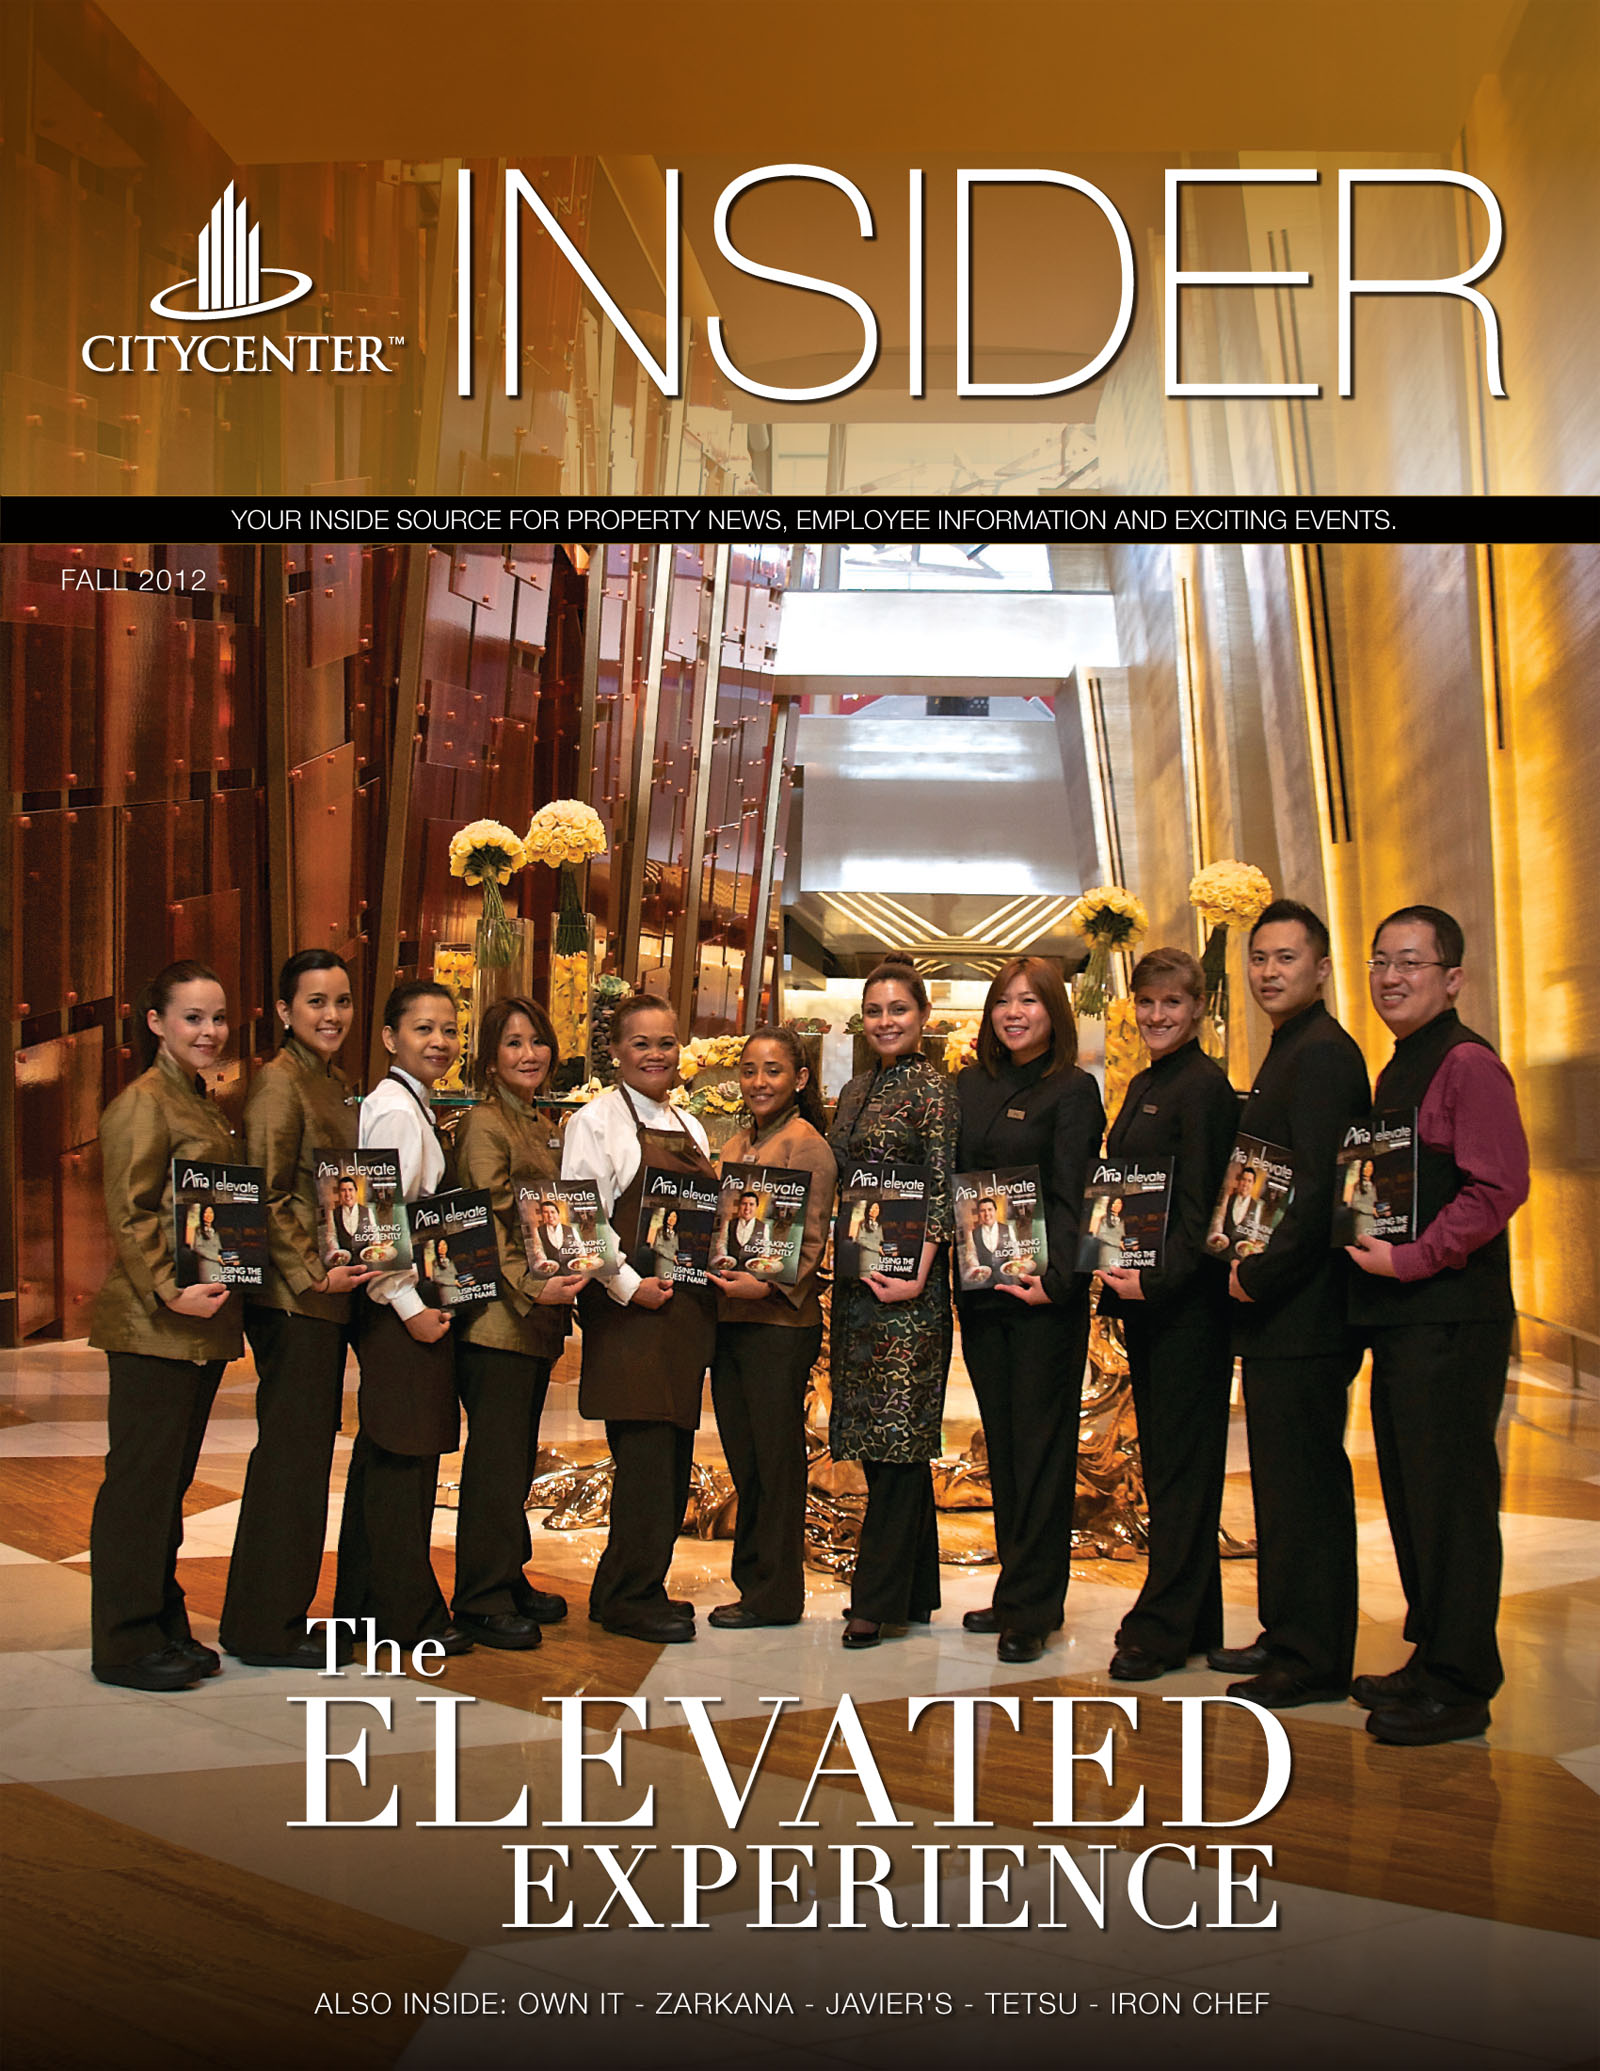 CityCenter's 2012 Fall Issue INSIDER MAGAZINE